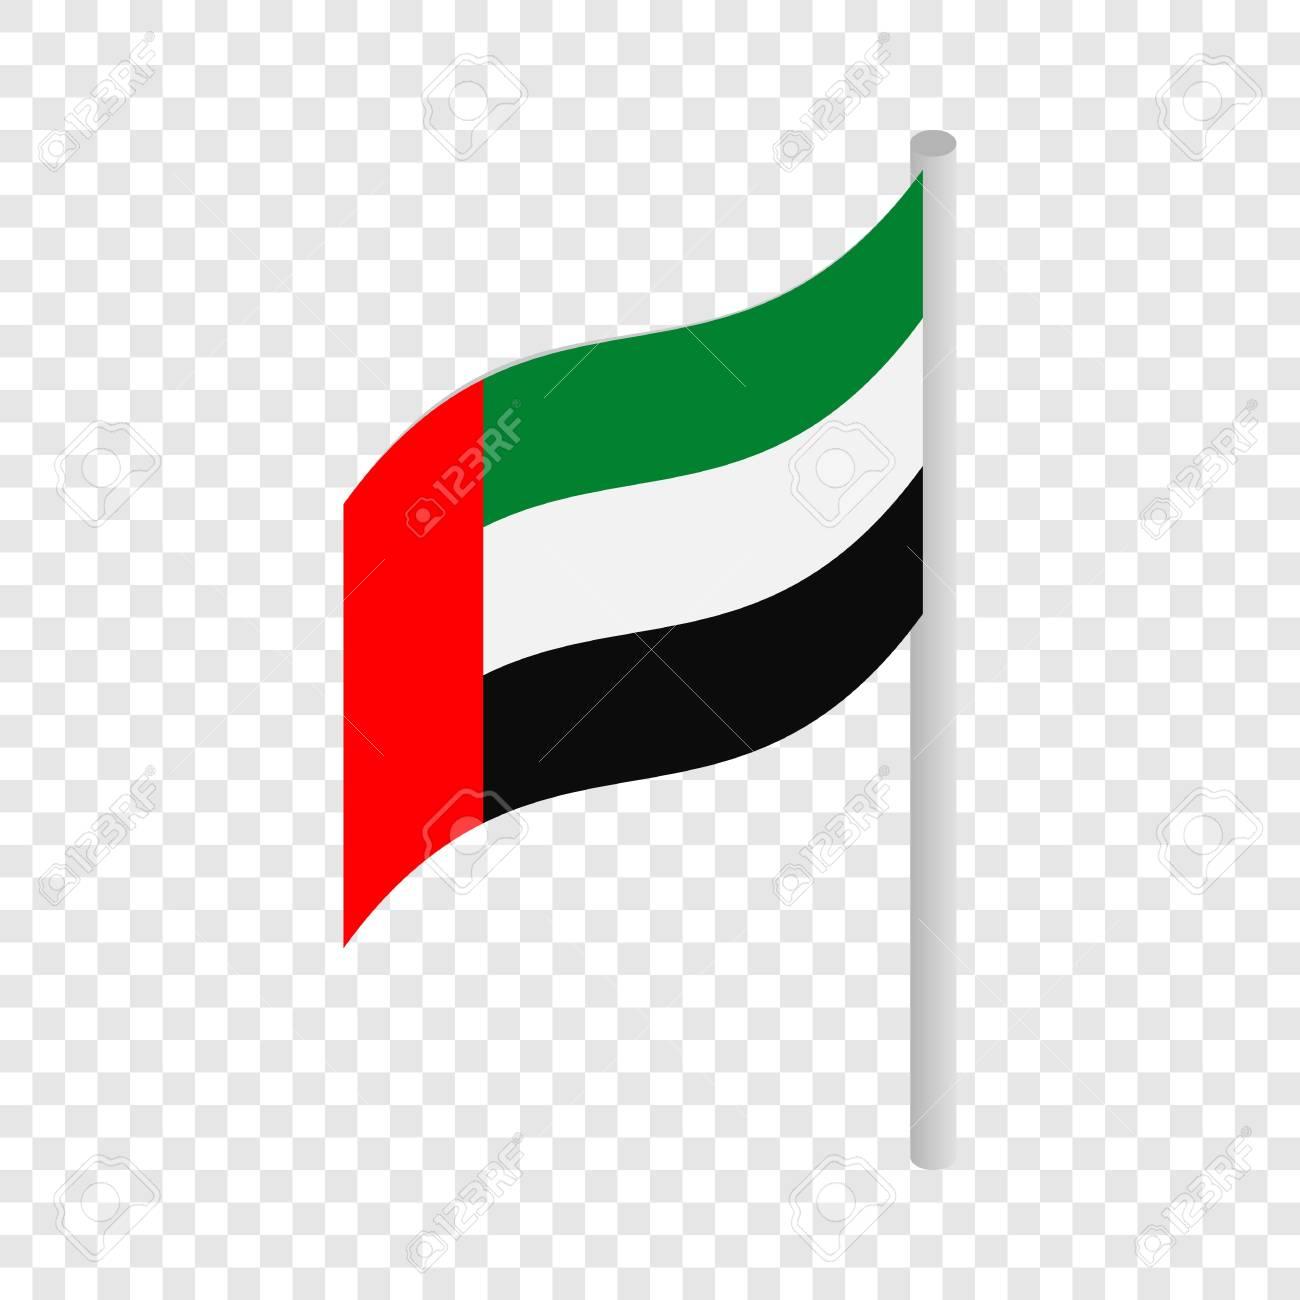 flag of united arab emirates isometric icon 3d on a transparent